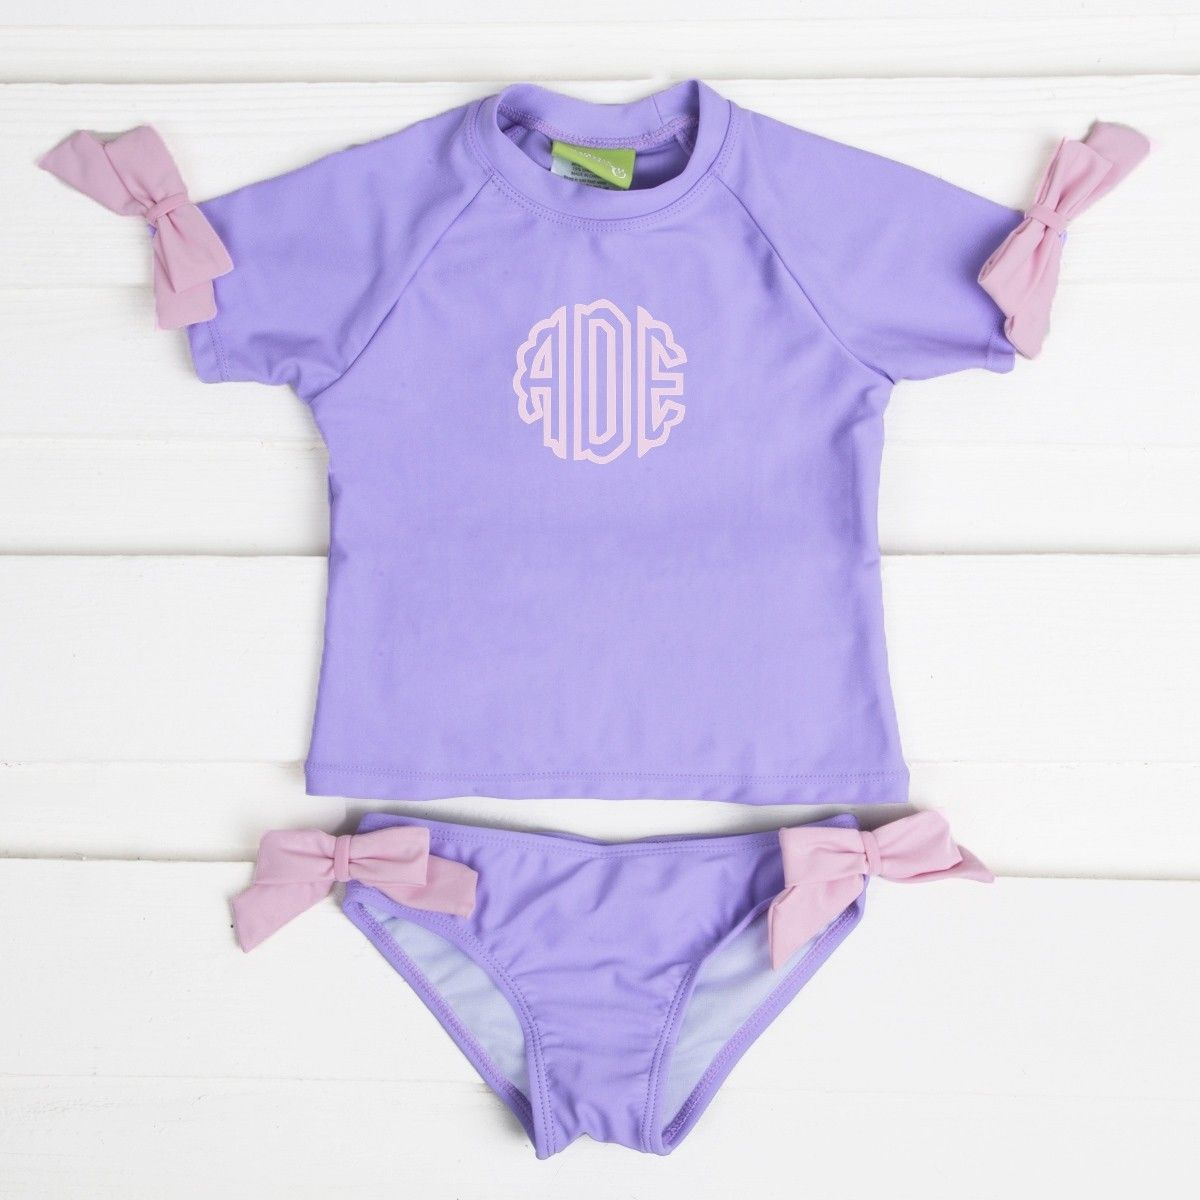 89a429dc87bc Bow Short Sleeve Rash Guard Lavender - Swimwear - Girls Smocked Auctions